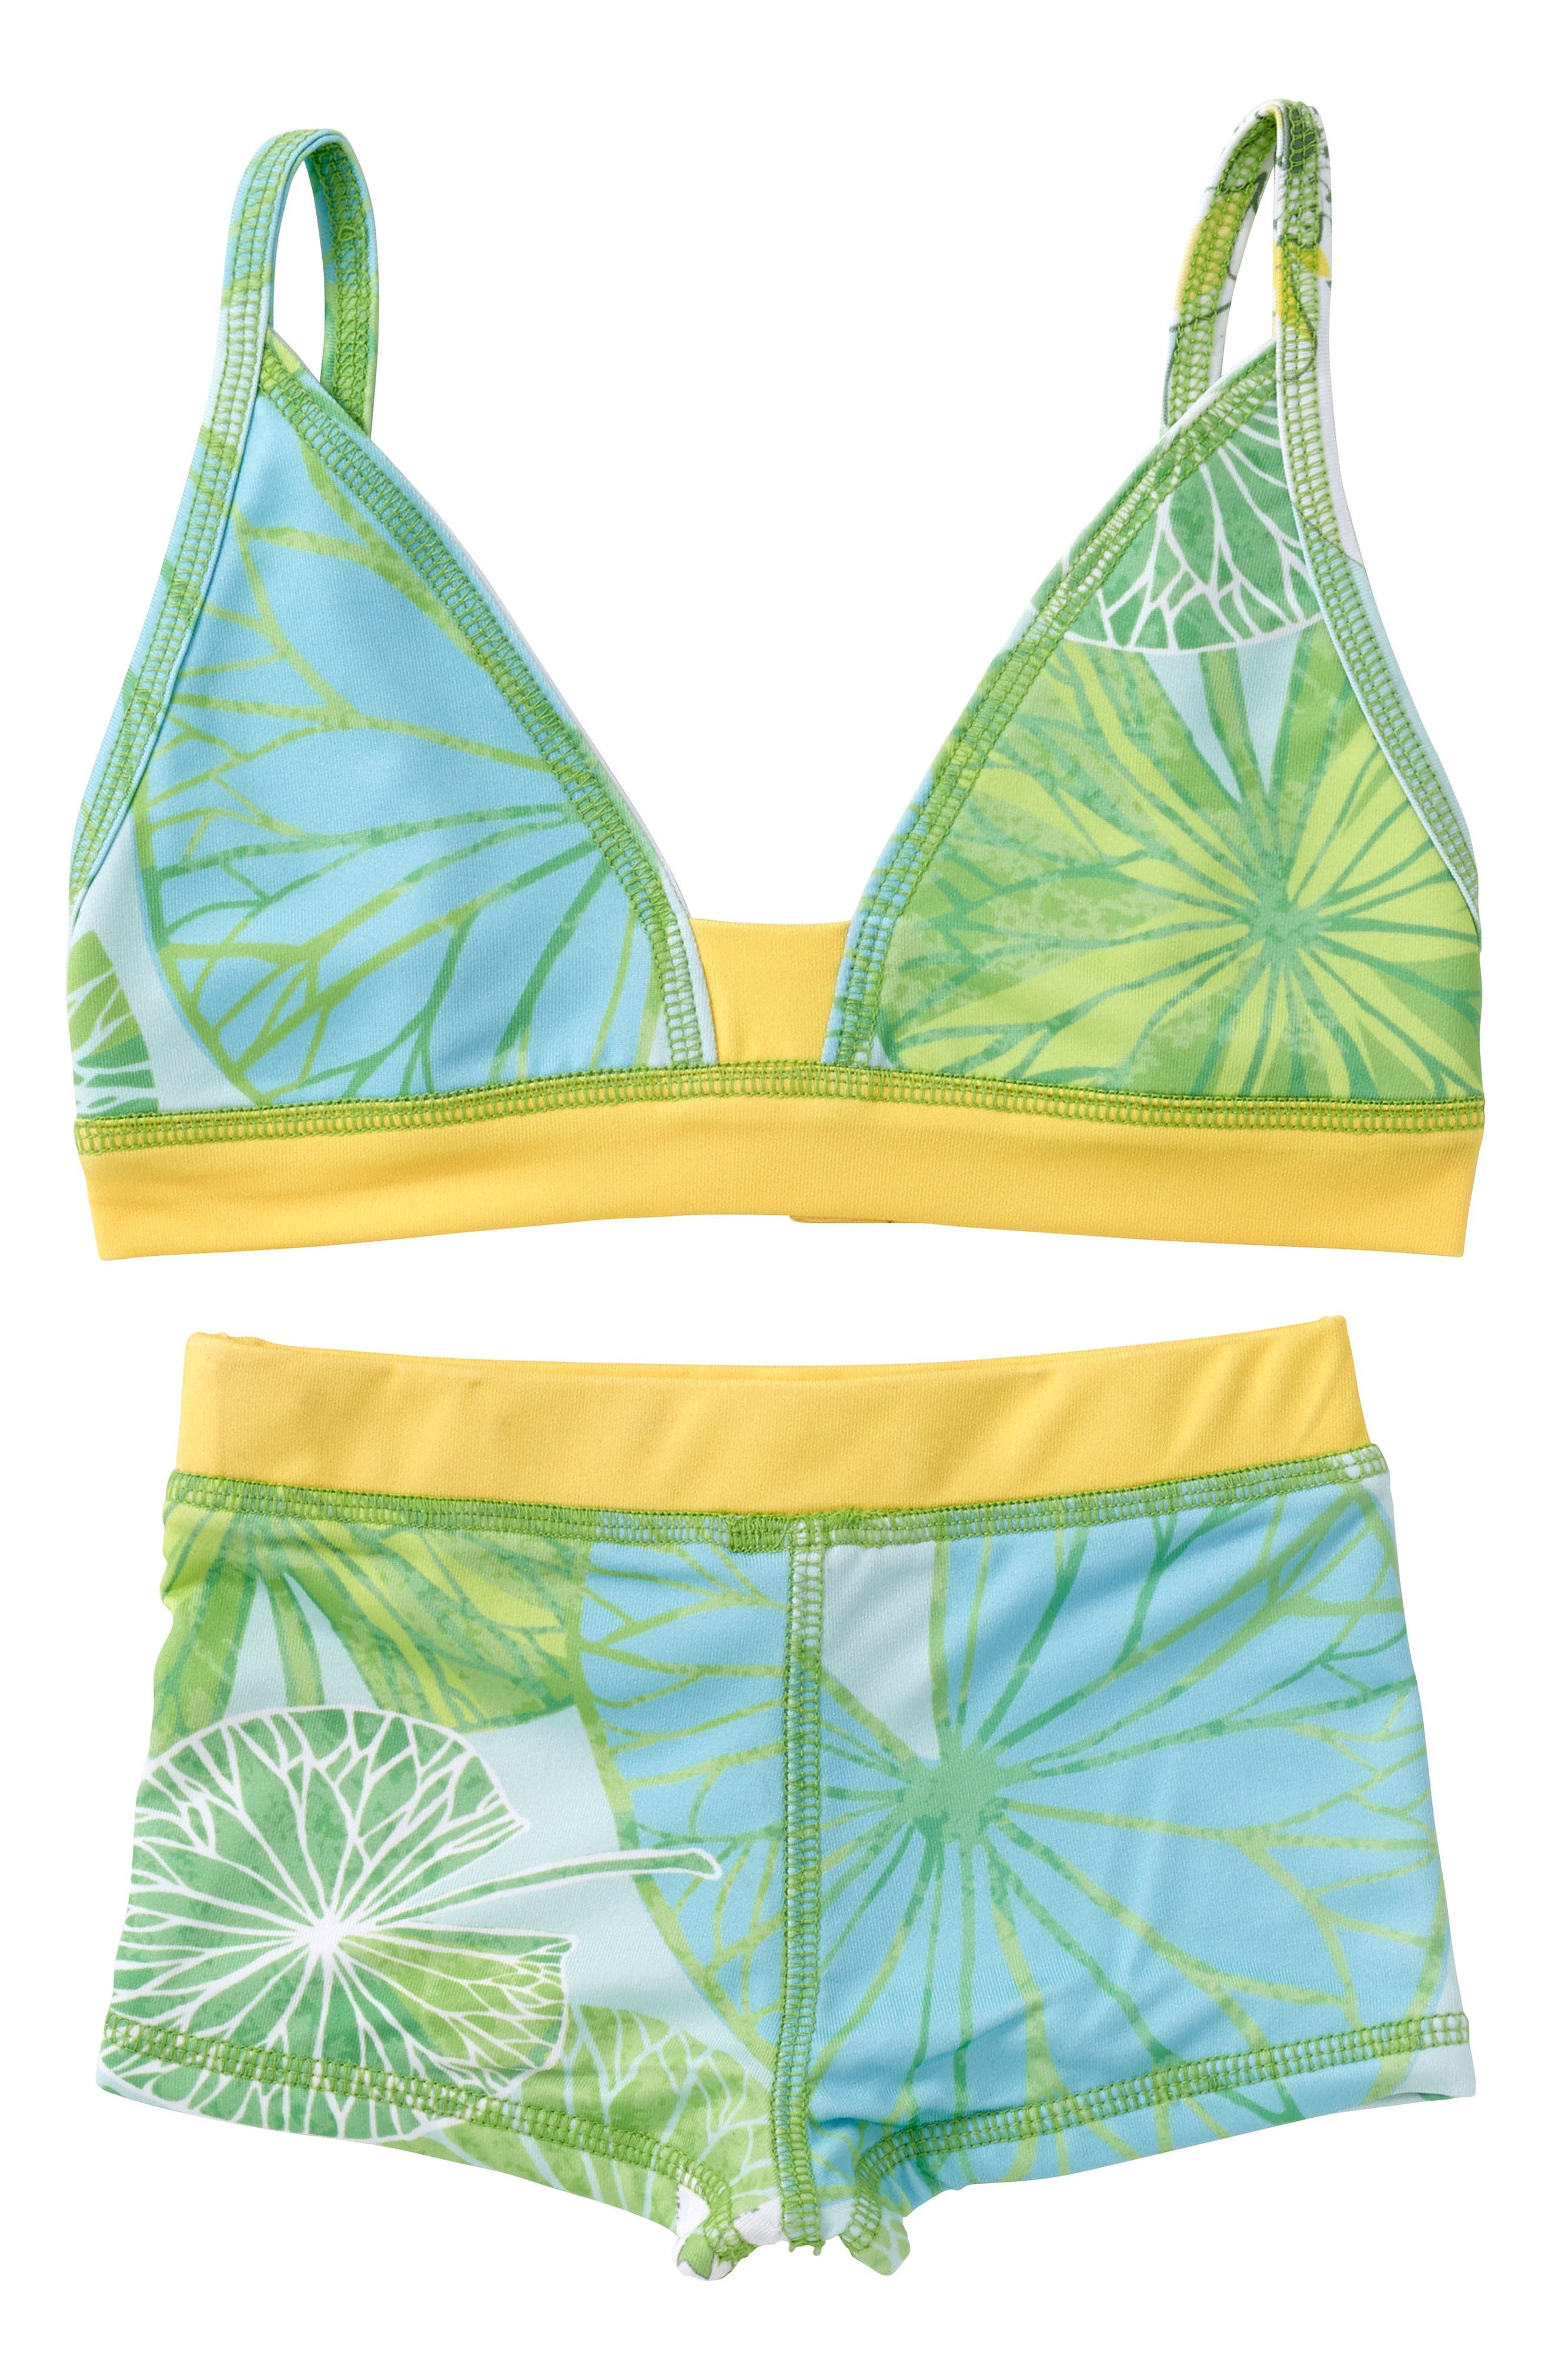 Alternate Image 1 Selected - Masasla Baby Two-Piece Swimsuit (Toddler Girls, Little Girls & Big Girls)